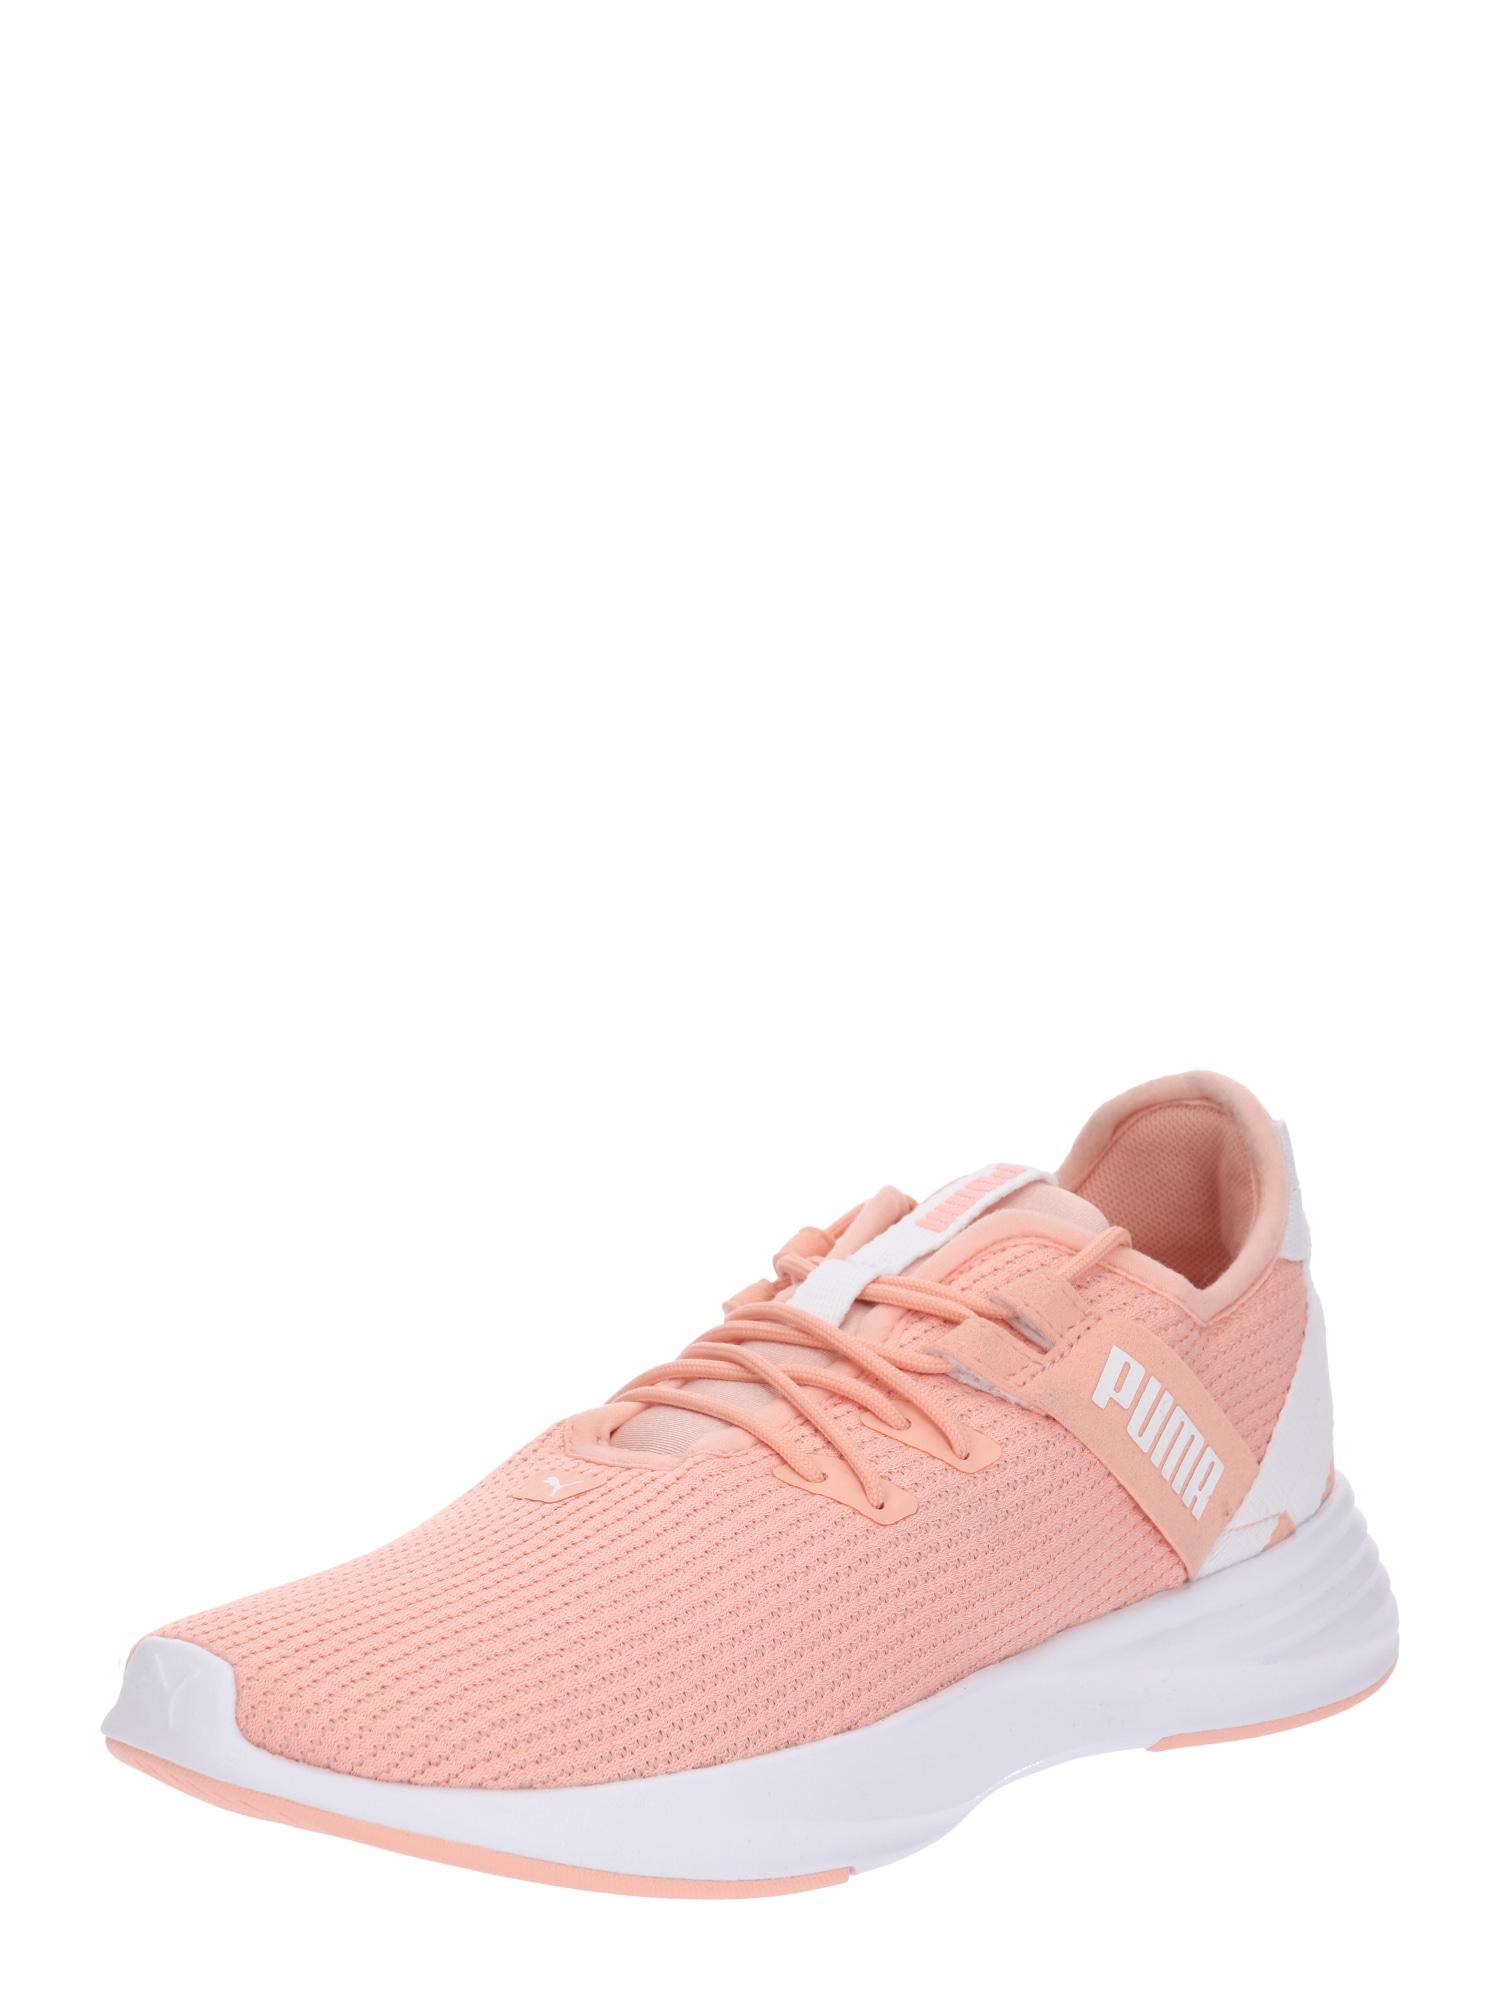 Sportovní boty Radiate XT broskvová bílá PUMA